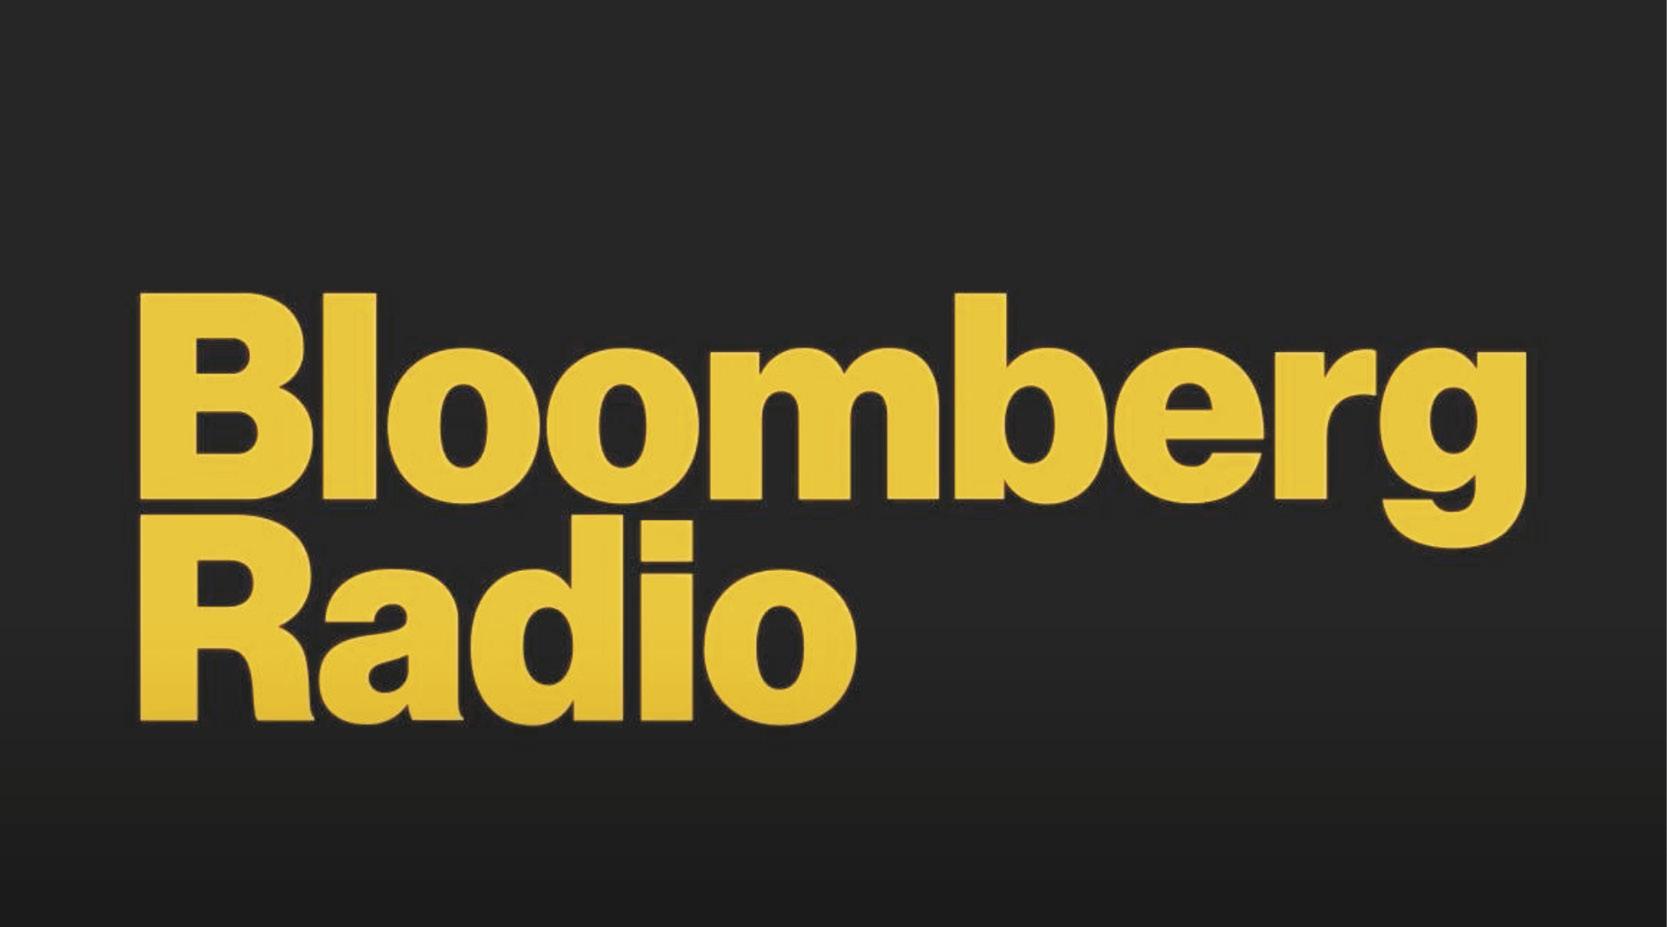 Speaking to Bloomberg LP Radio